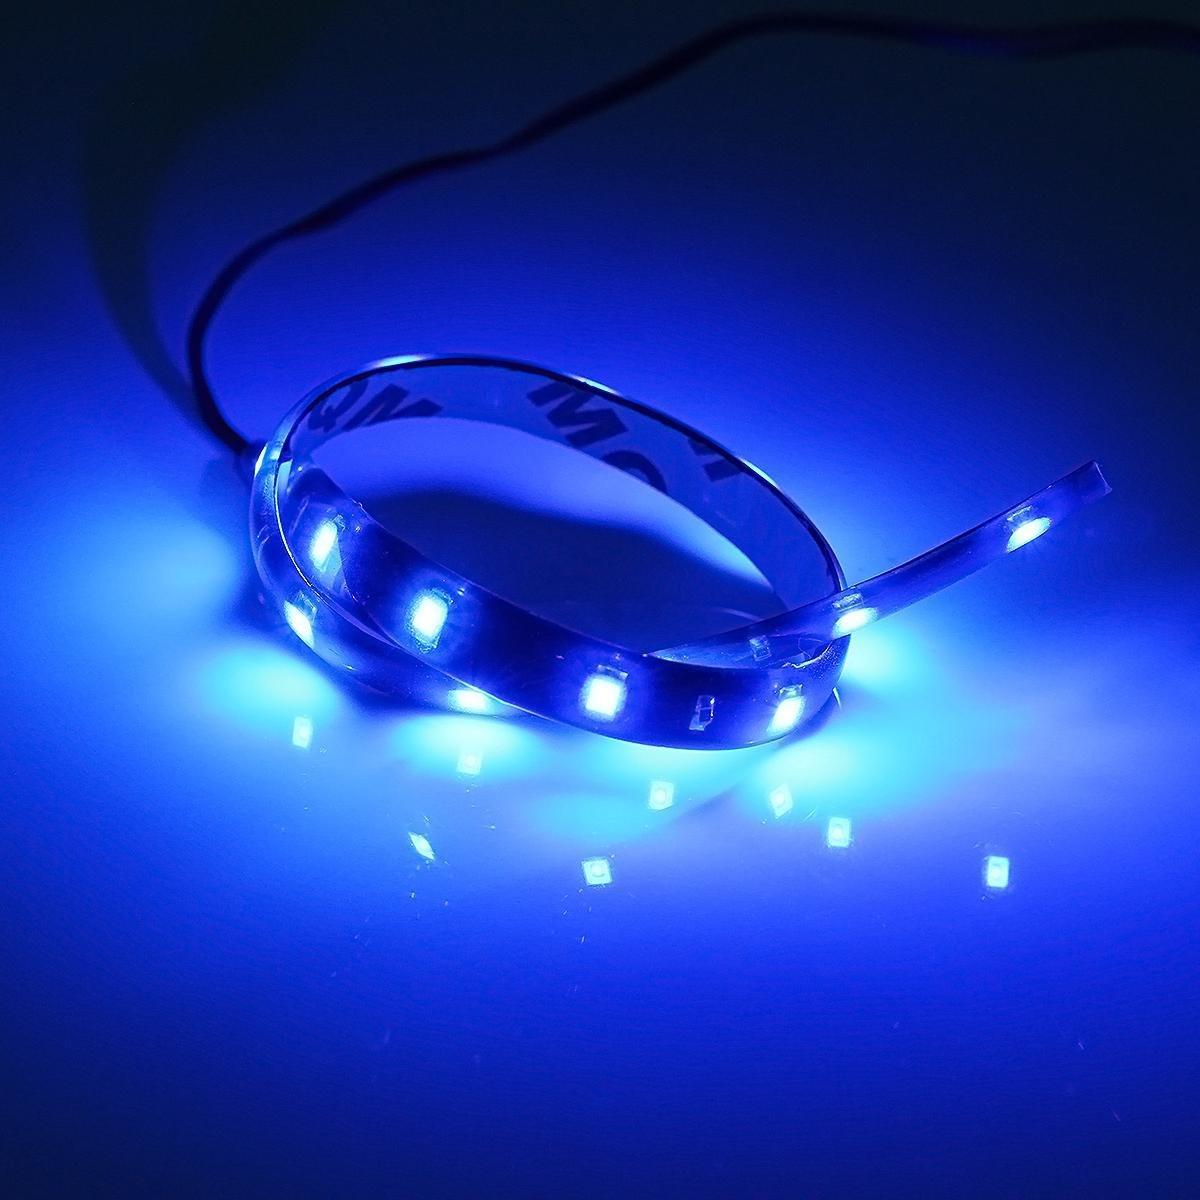 Partsam 4PCS 12 15-3528-SMD Blue LED Strip Lights Interior Under Dash Floor Light for Cars Trucks Pickup Glow Neon Lighting Side footwells Light